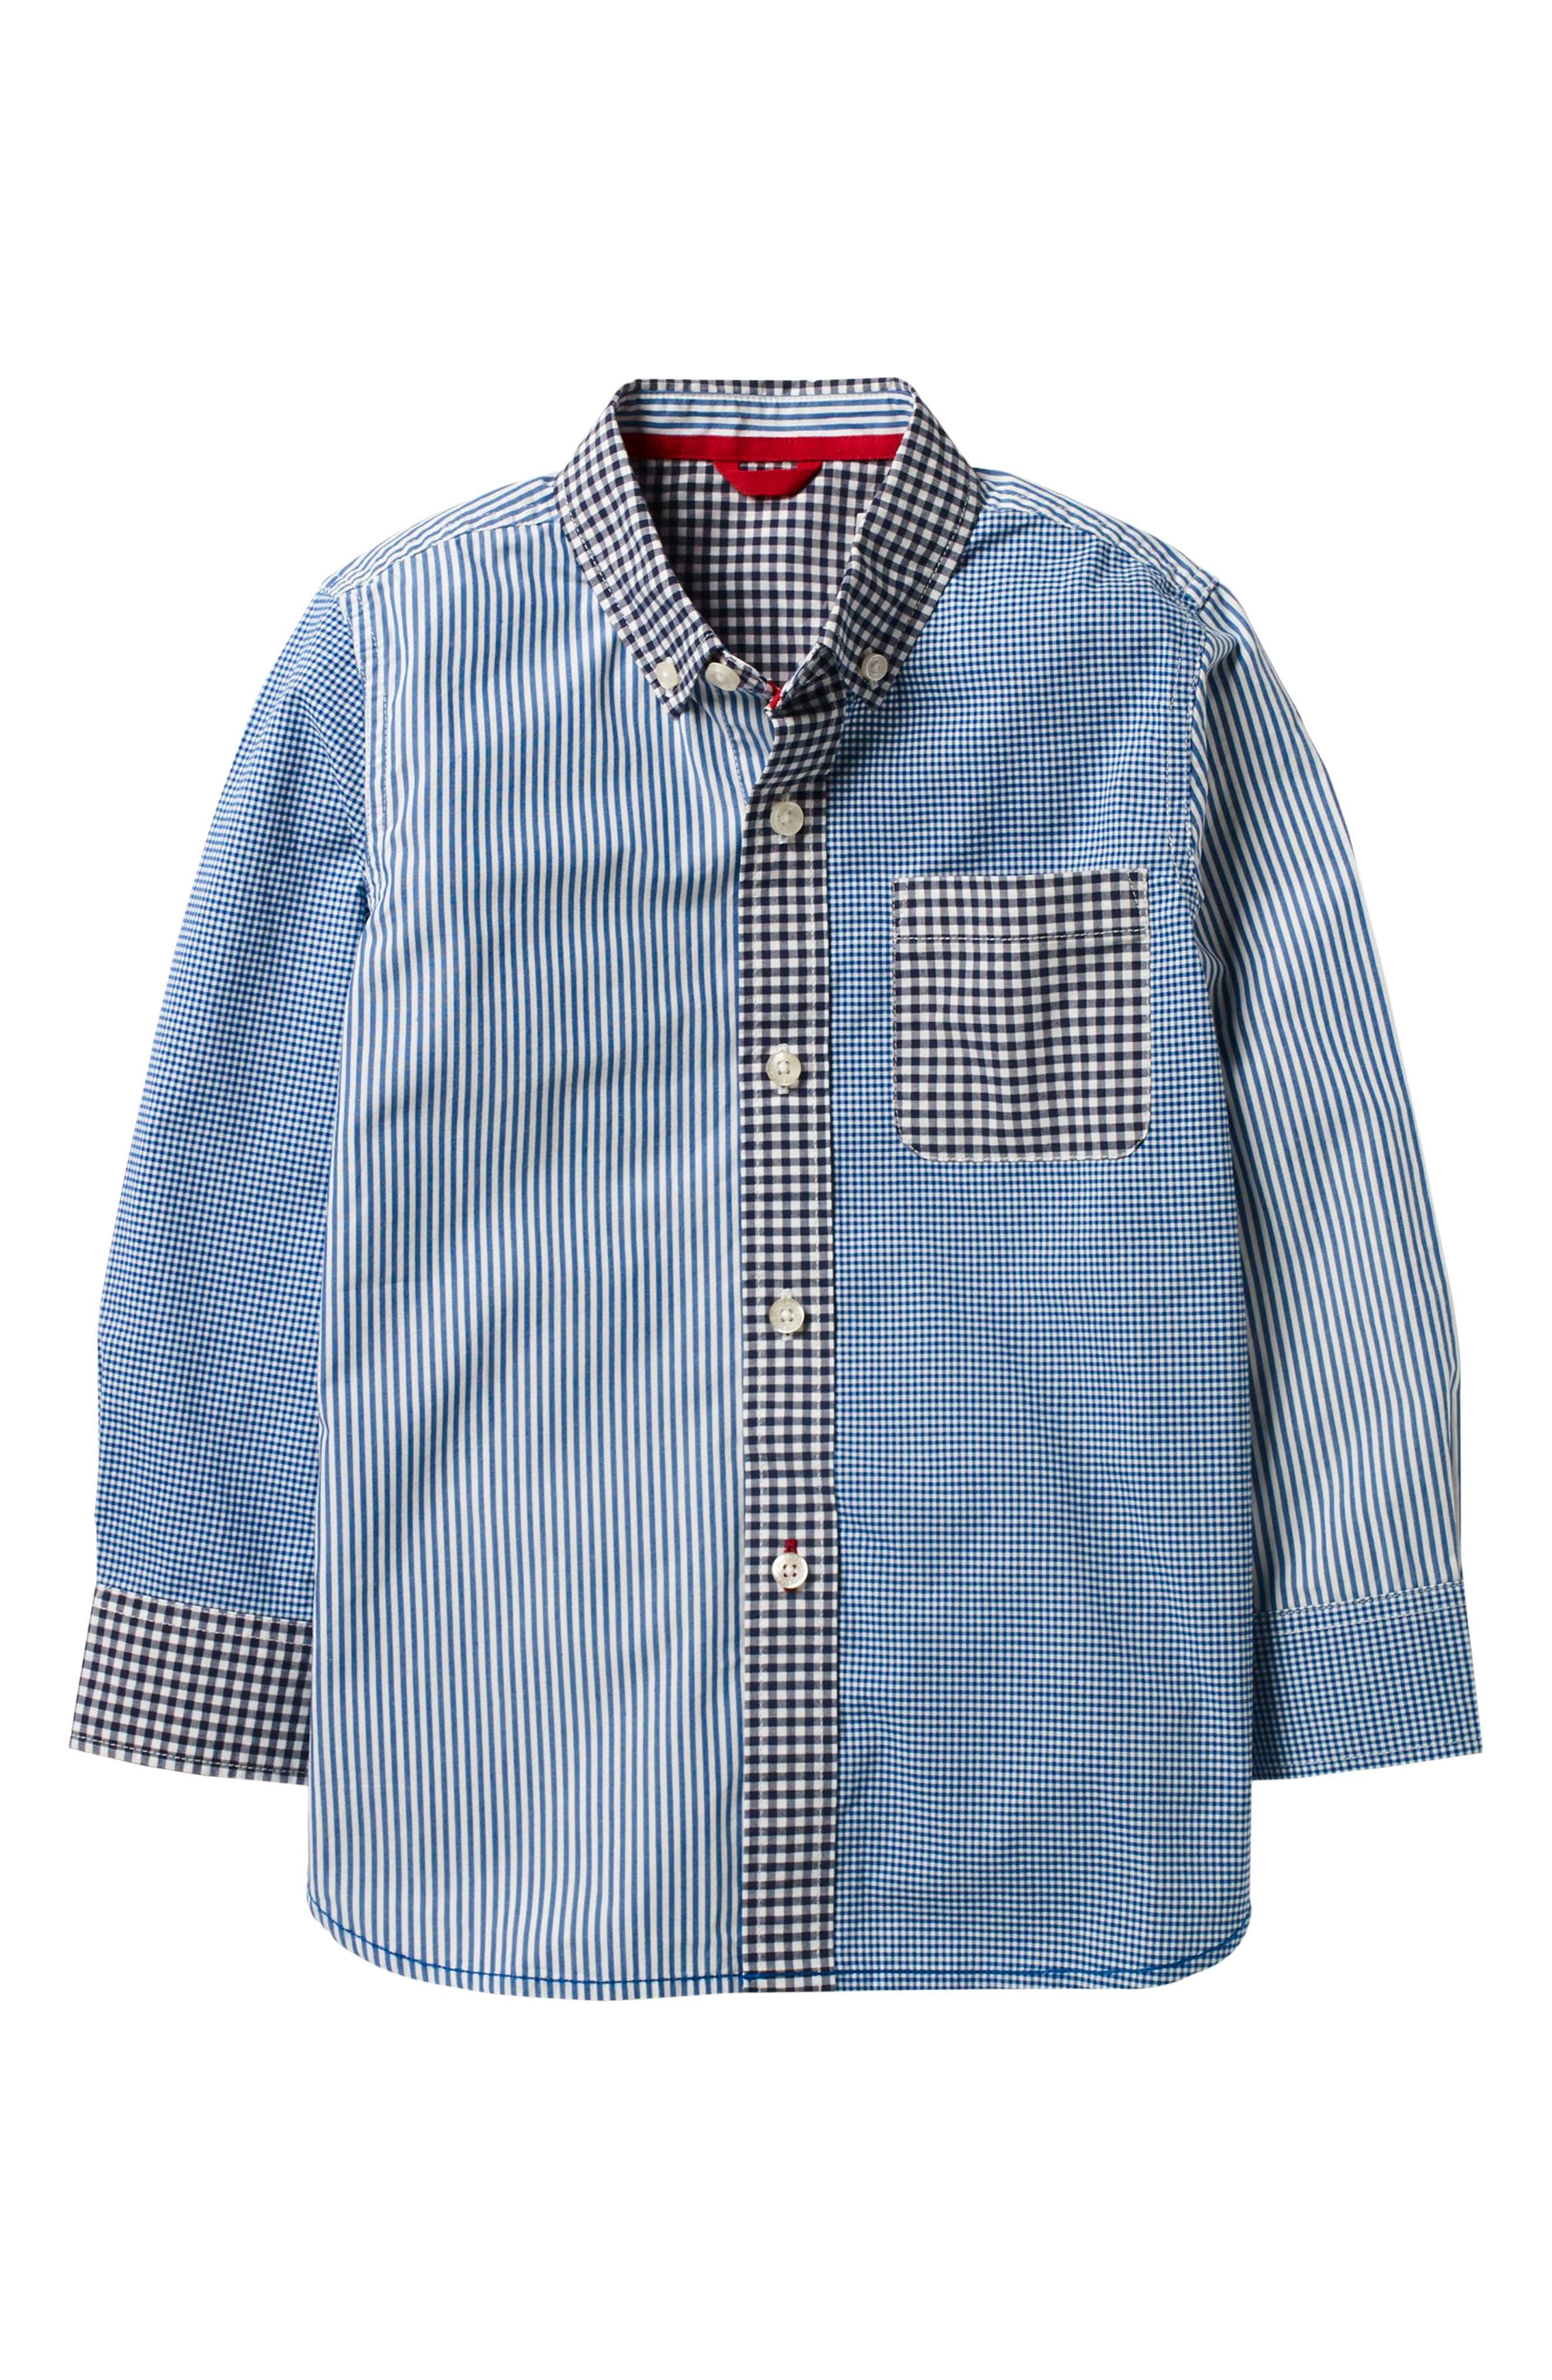 Hotchpotch Laundered Shirt,                             Main thumbnail 1, color,                             454